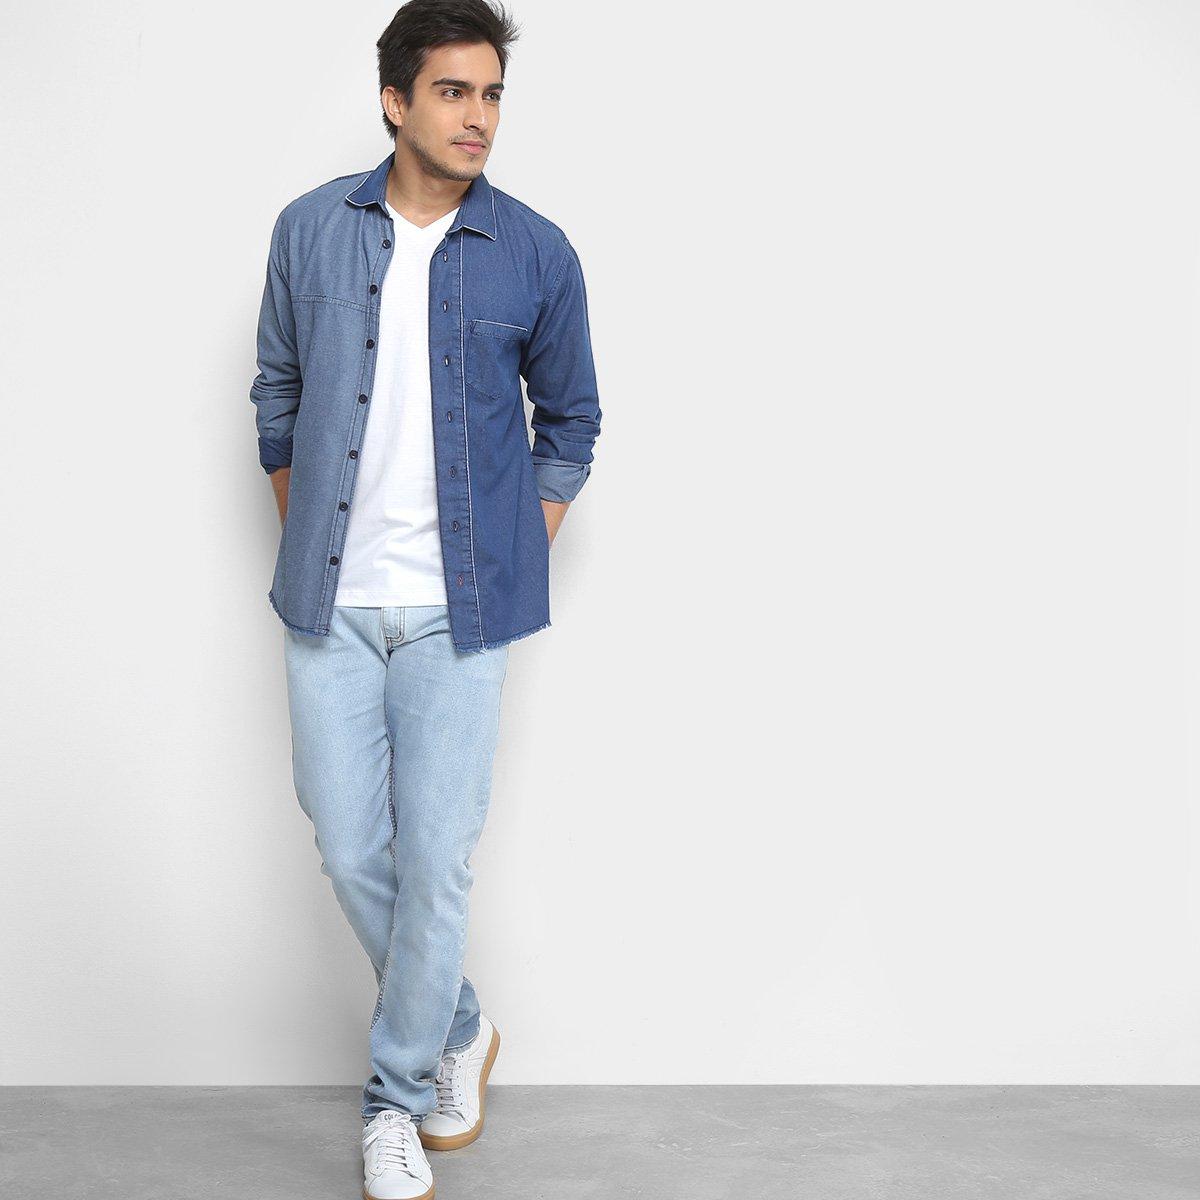 Camisa Jeans Forum Smart Masculina - Azul